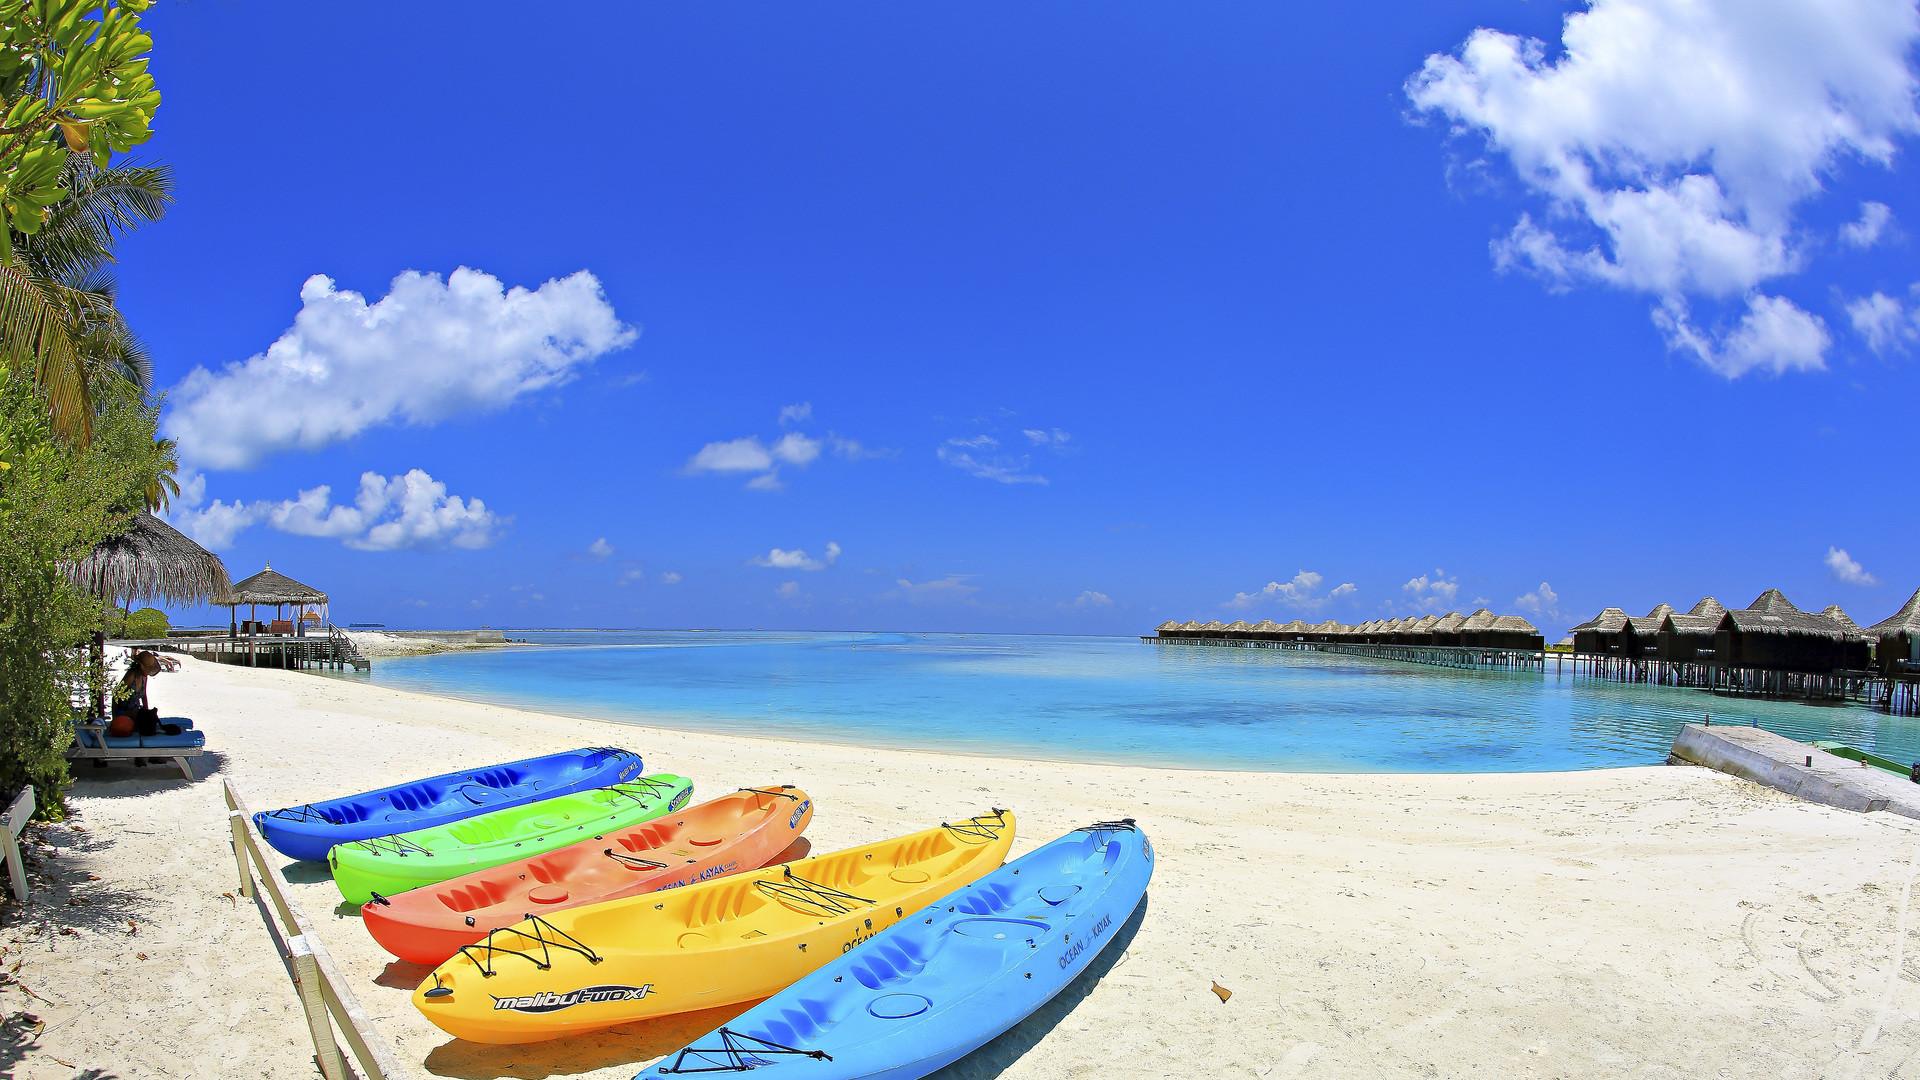 Tropical Beach Desktop Wallpapers (42 Wallpapers)